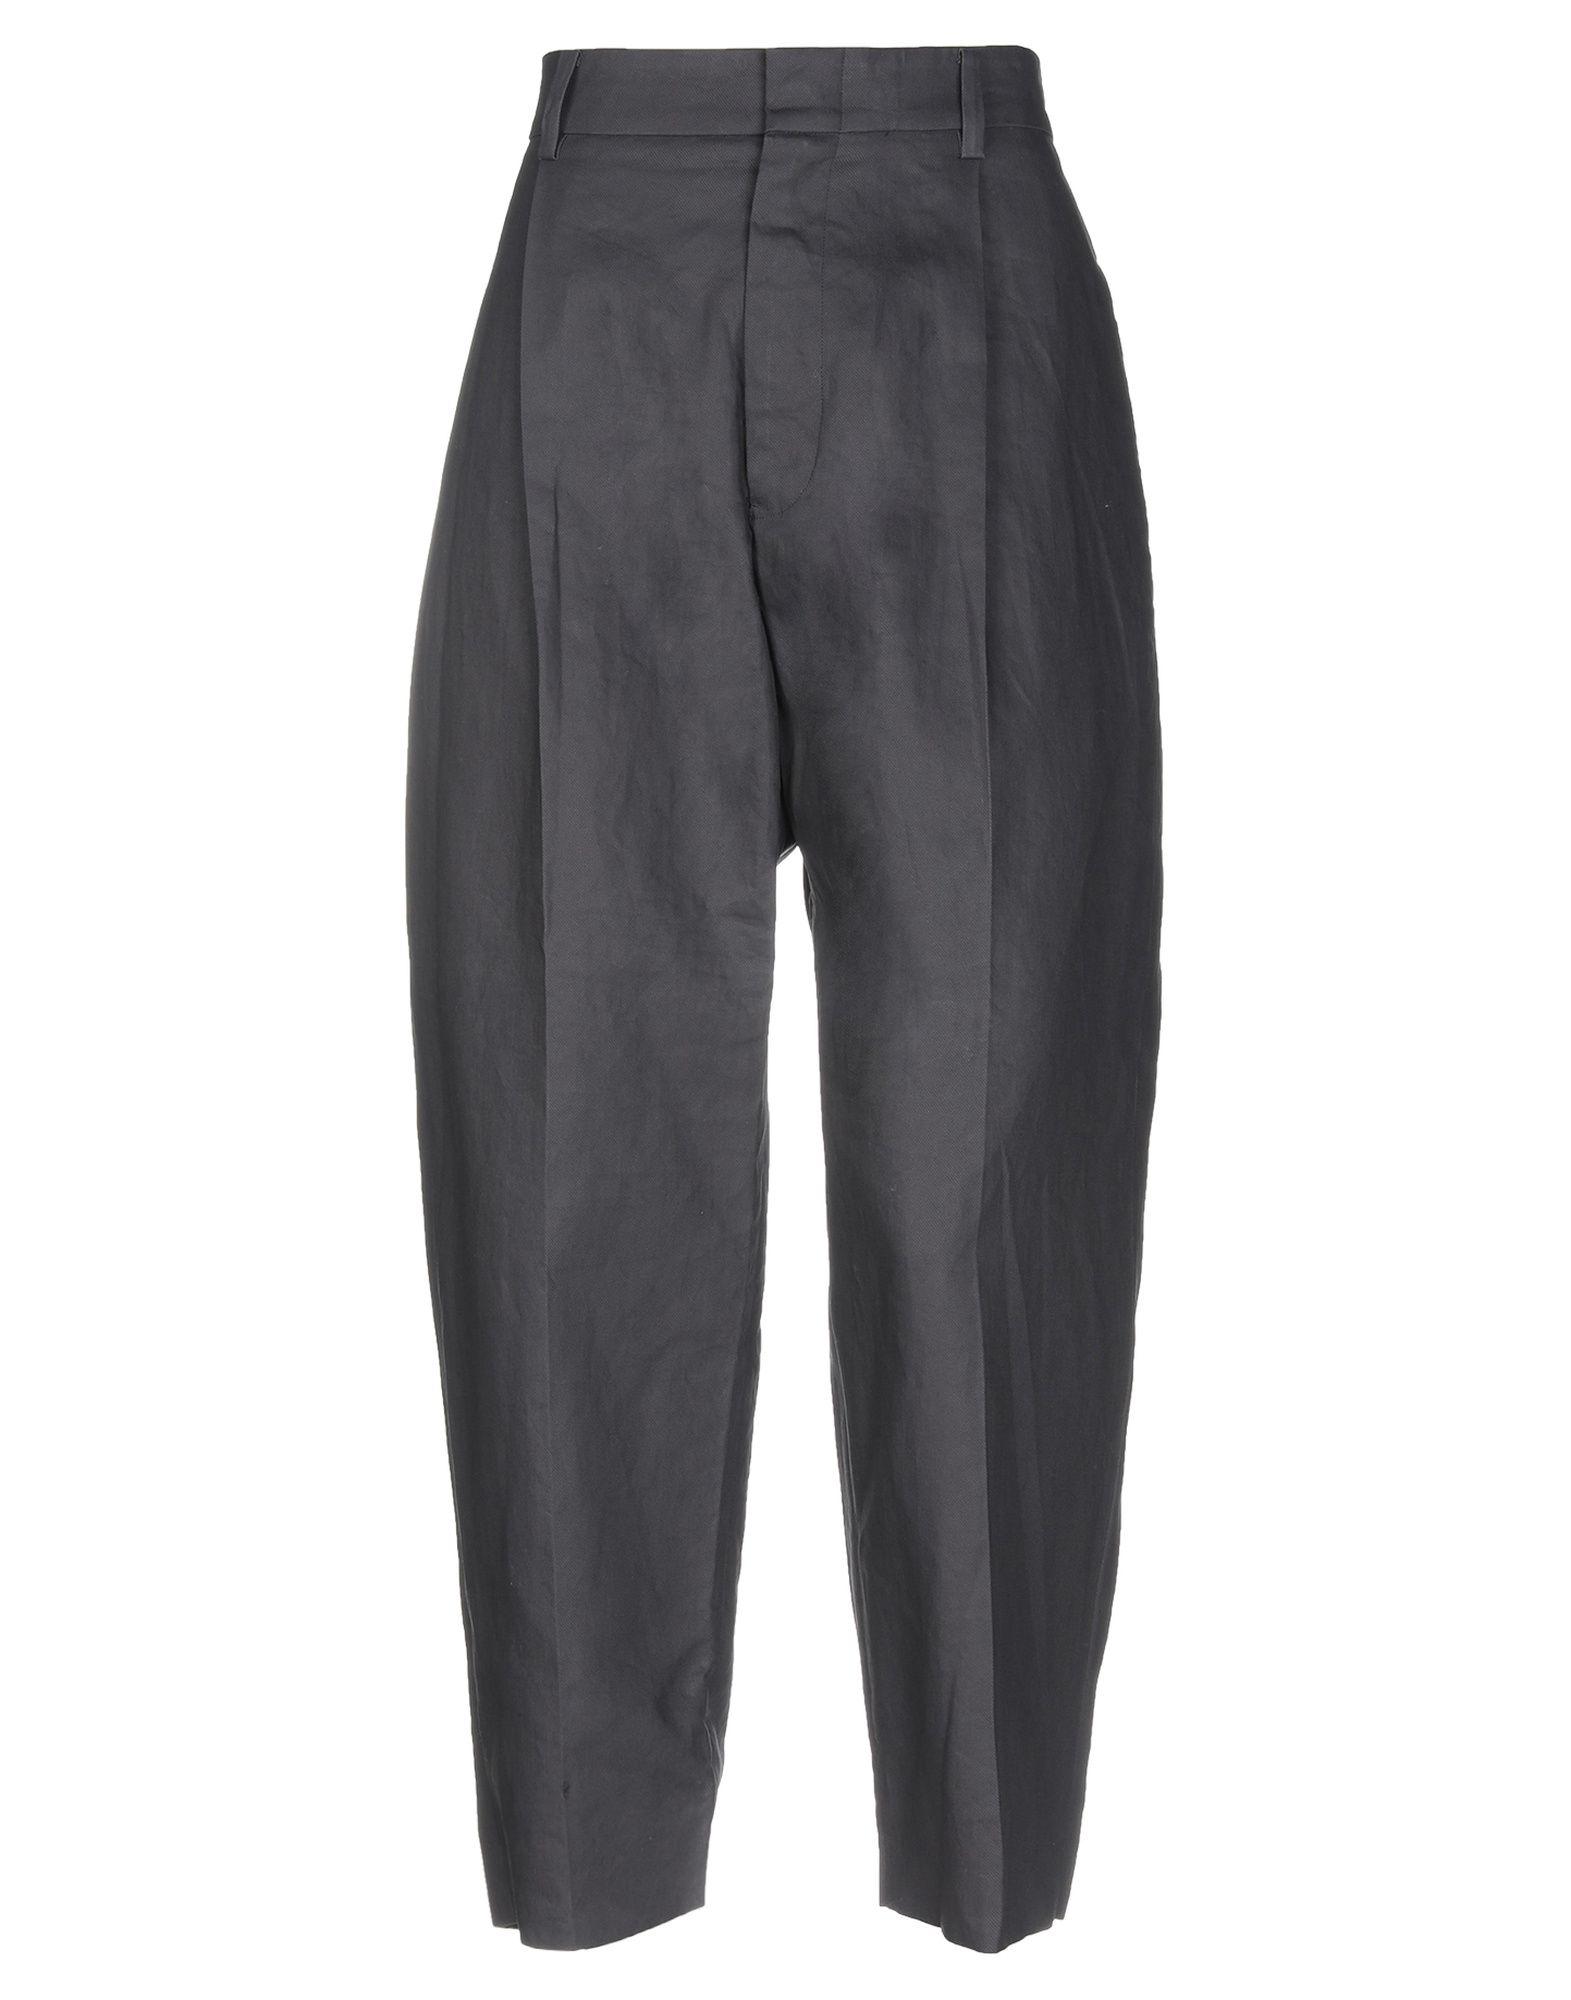 Pantalone Sofie D'hoore donna donna donna - 13288159GH 454